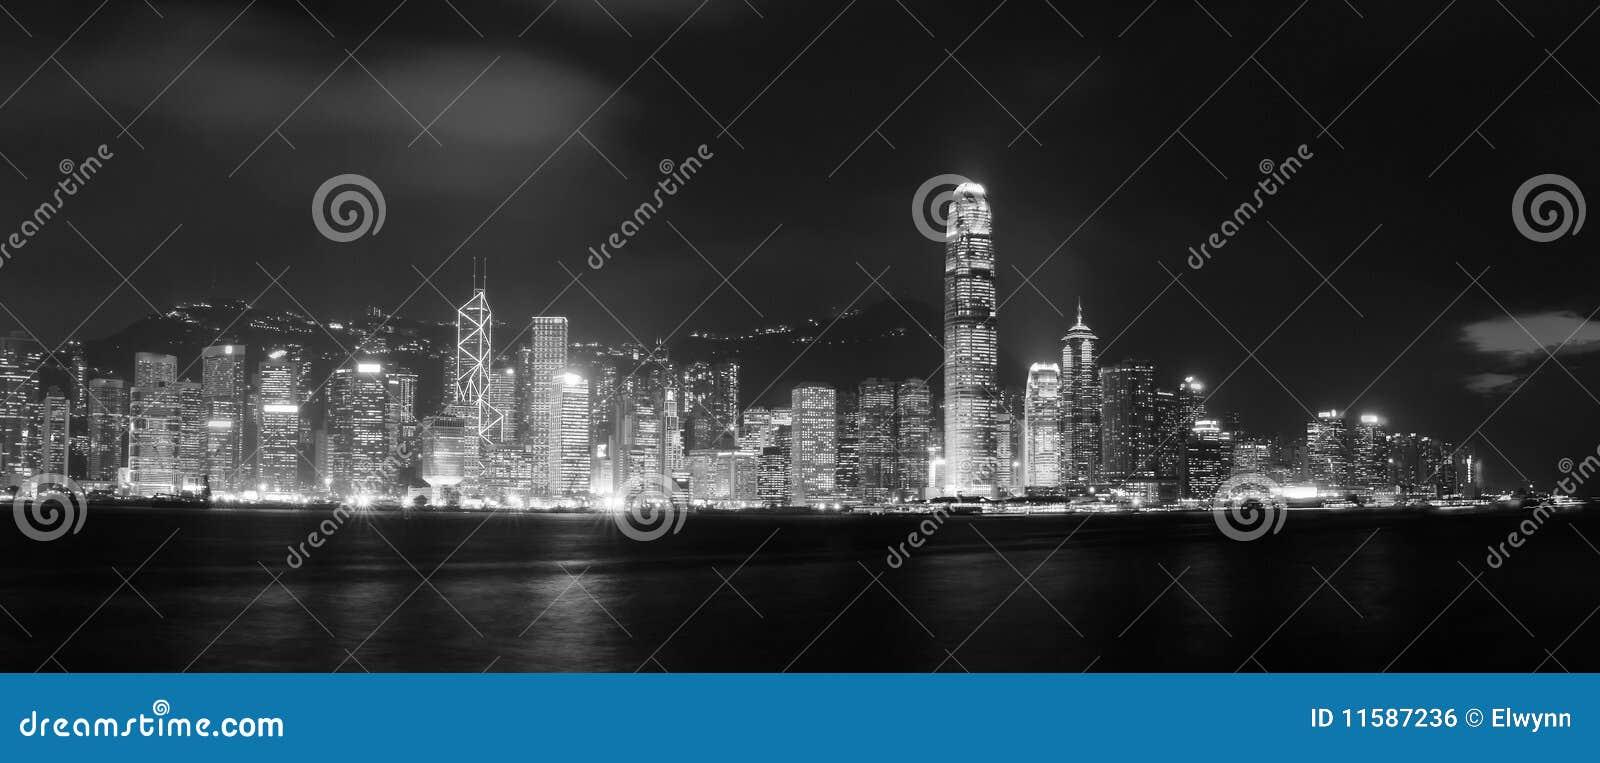 Panoramique excessif du port de Victoria au HK